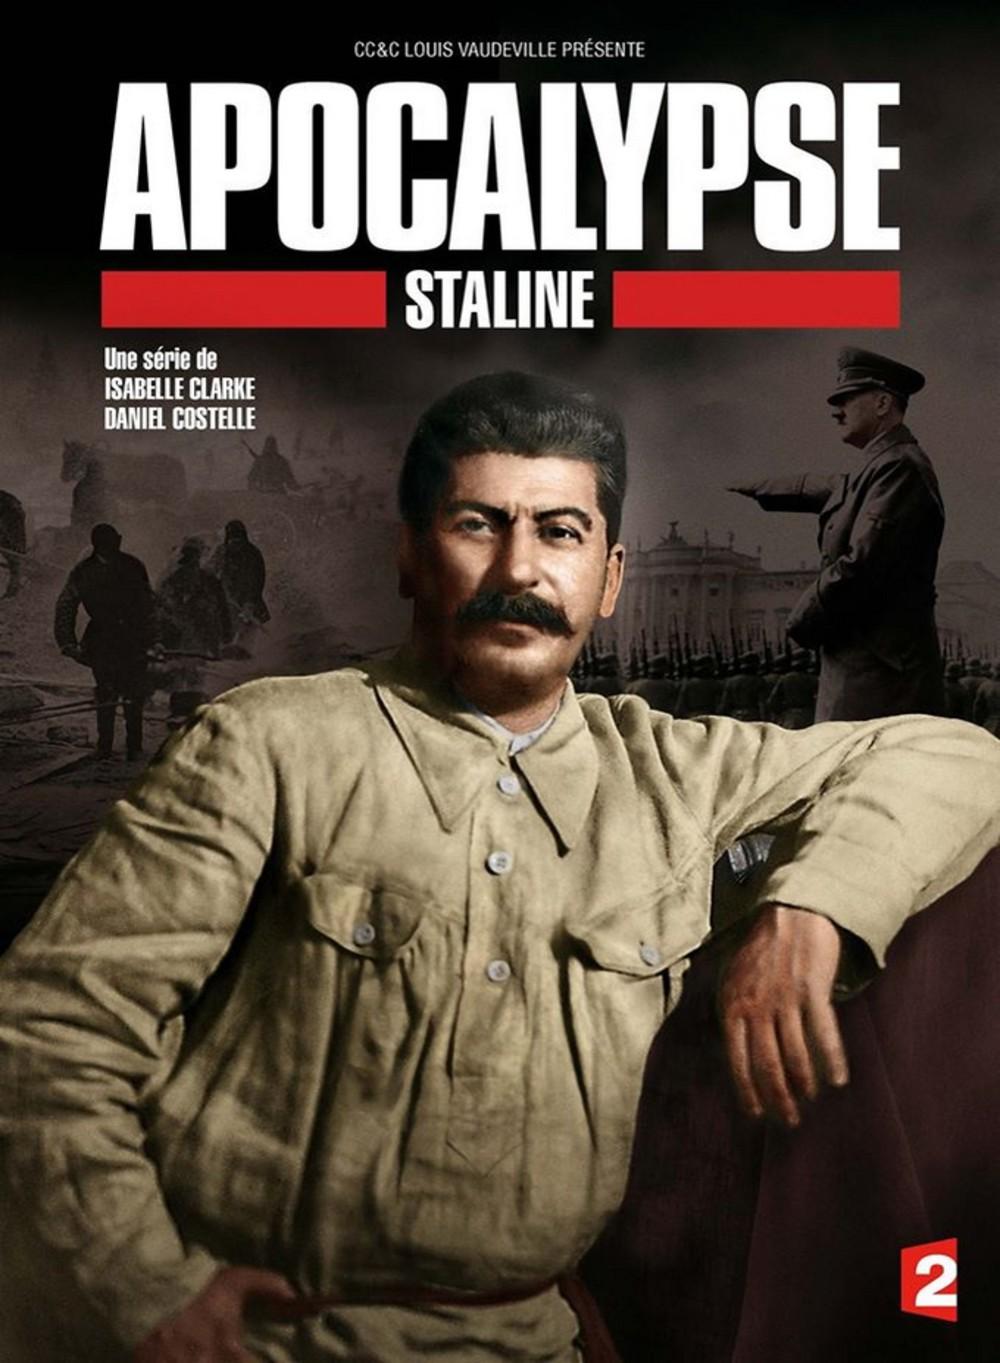 Joseph Stalin in Apocalypse: Staline (2015)